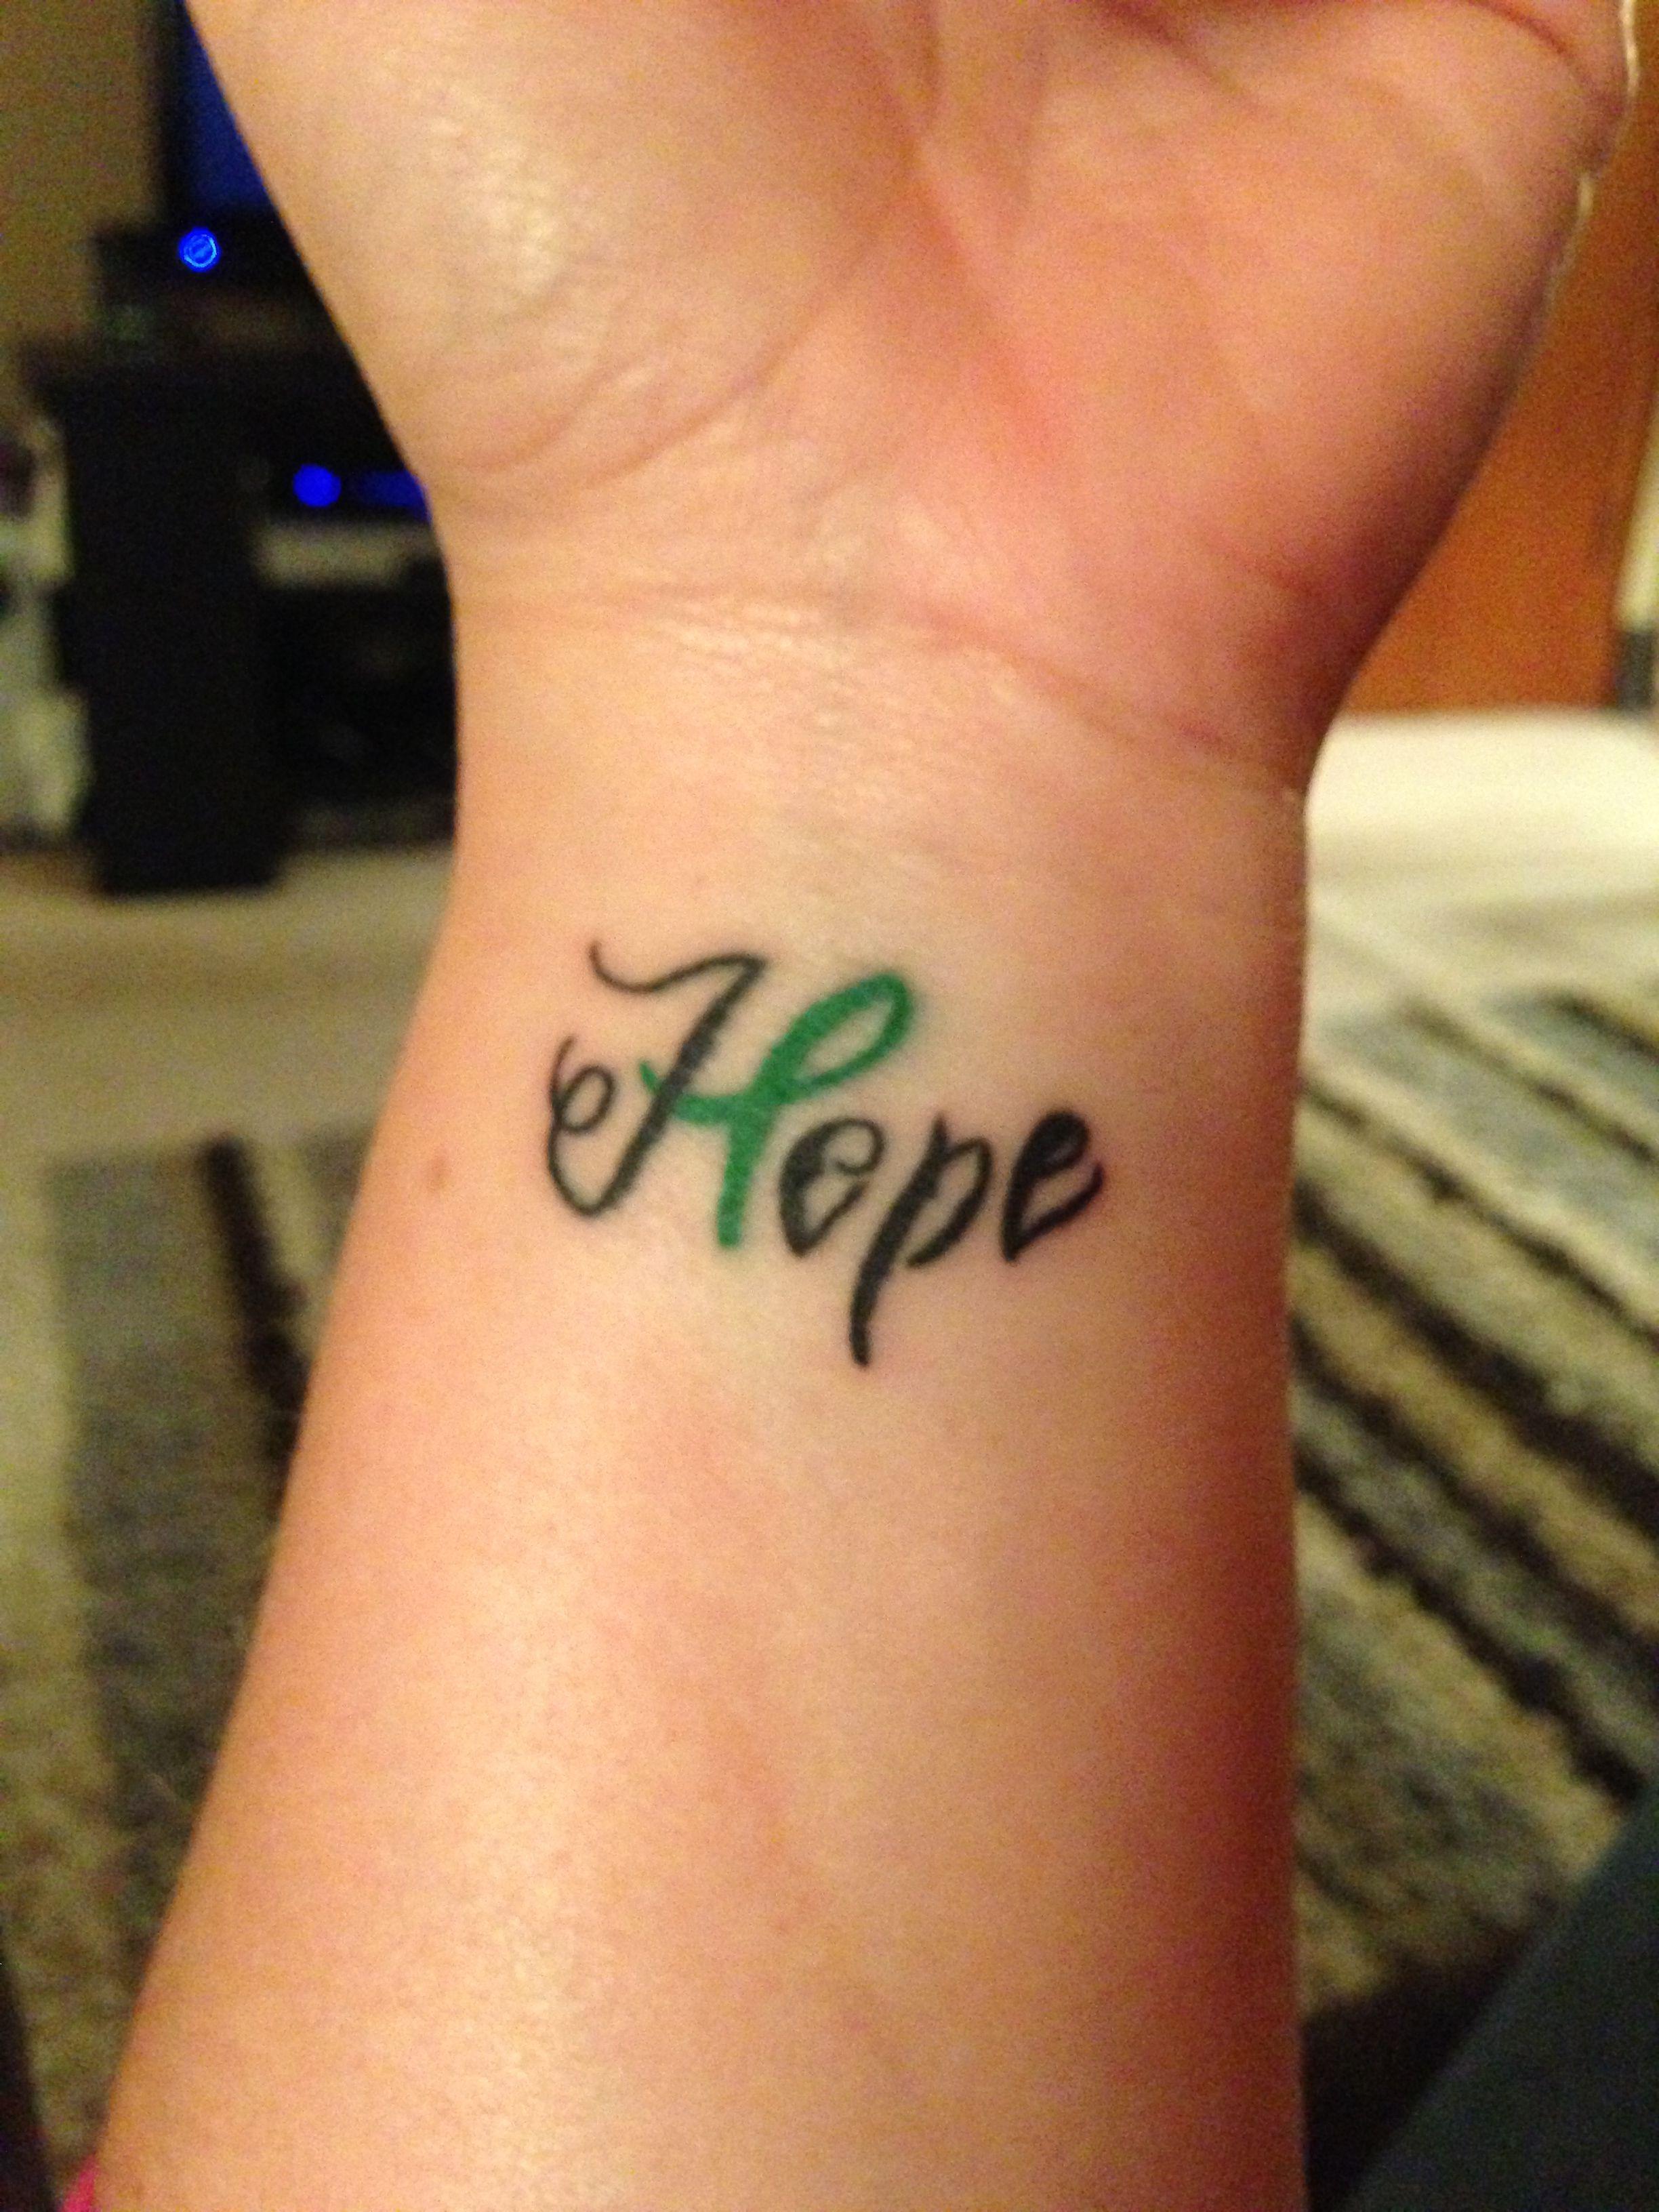 Tatuaje Lazo Cancer traumatic brain injury awareness ribbon #tattoo #hope #supporting my